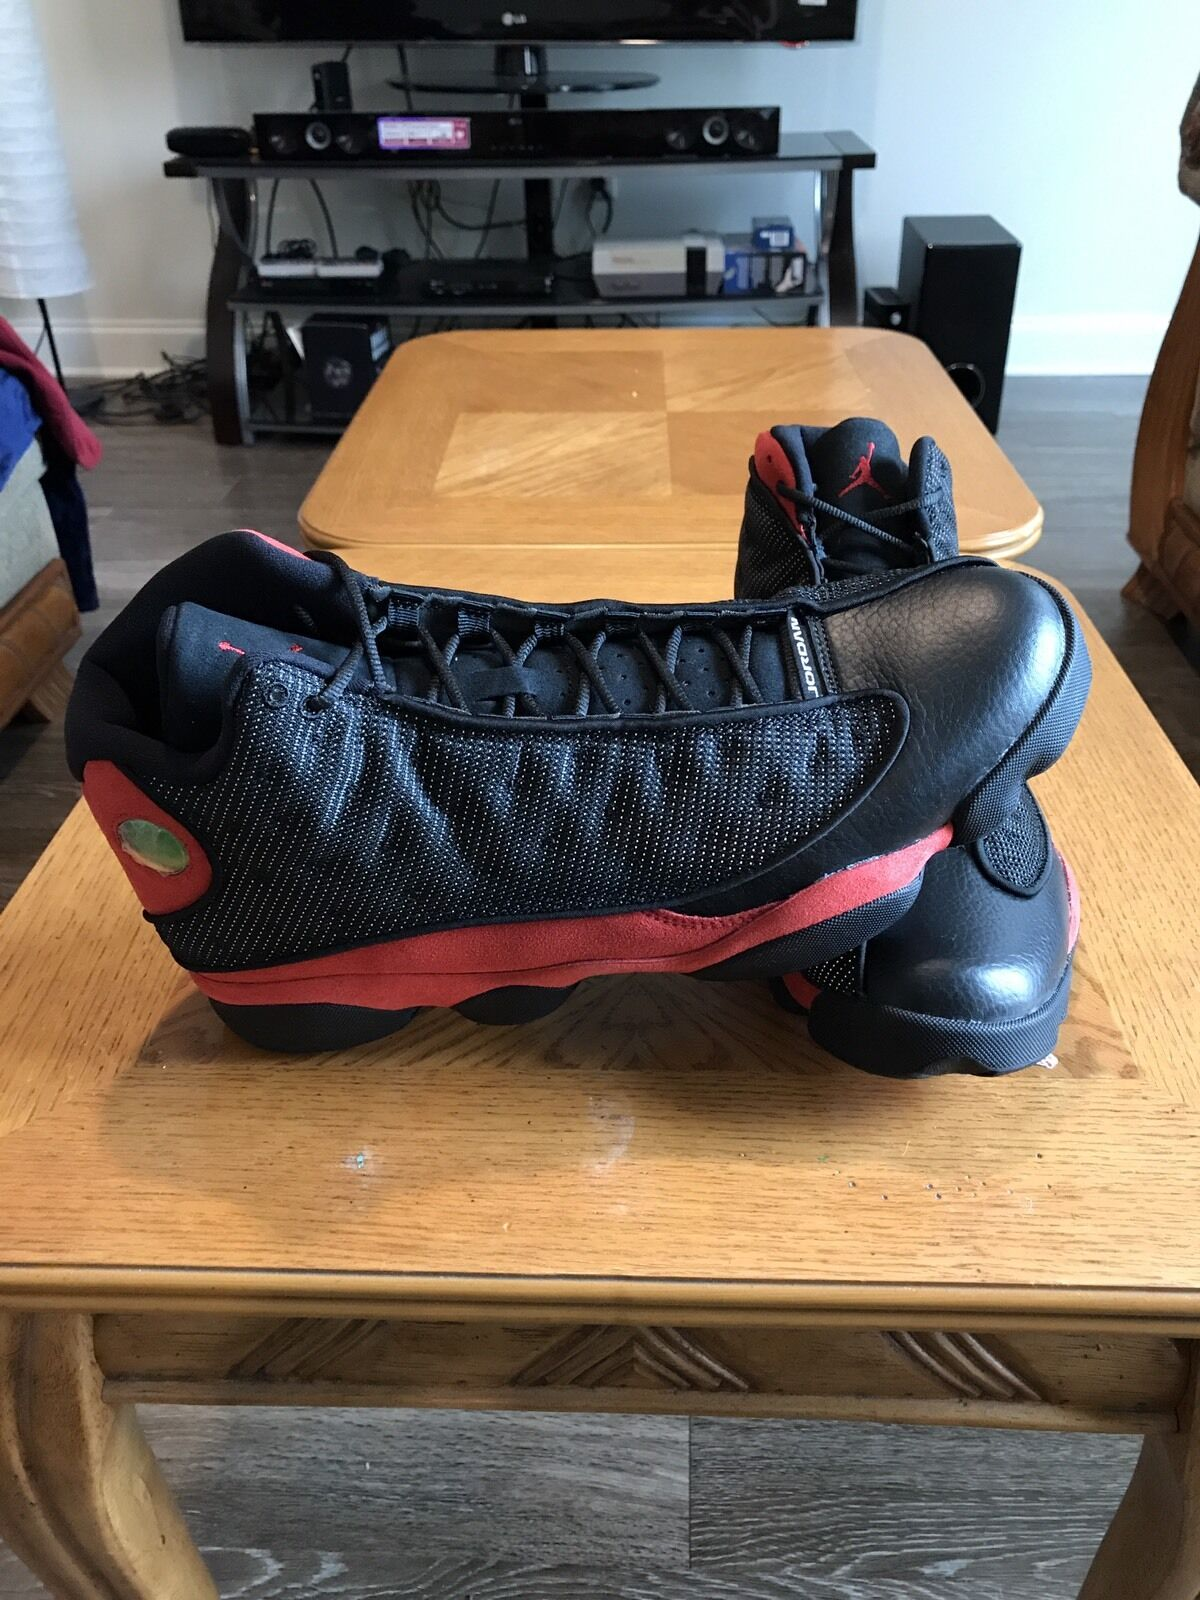 Air Jordan 13 (Bred) Retro (Bred) 13 Size 14 5e27d3